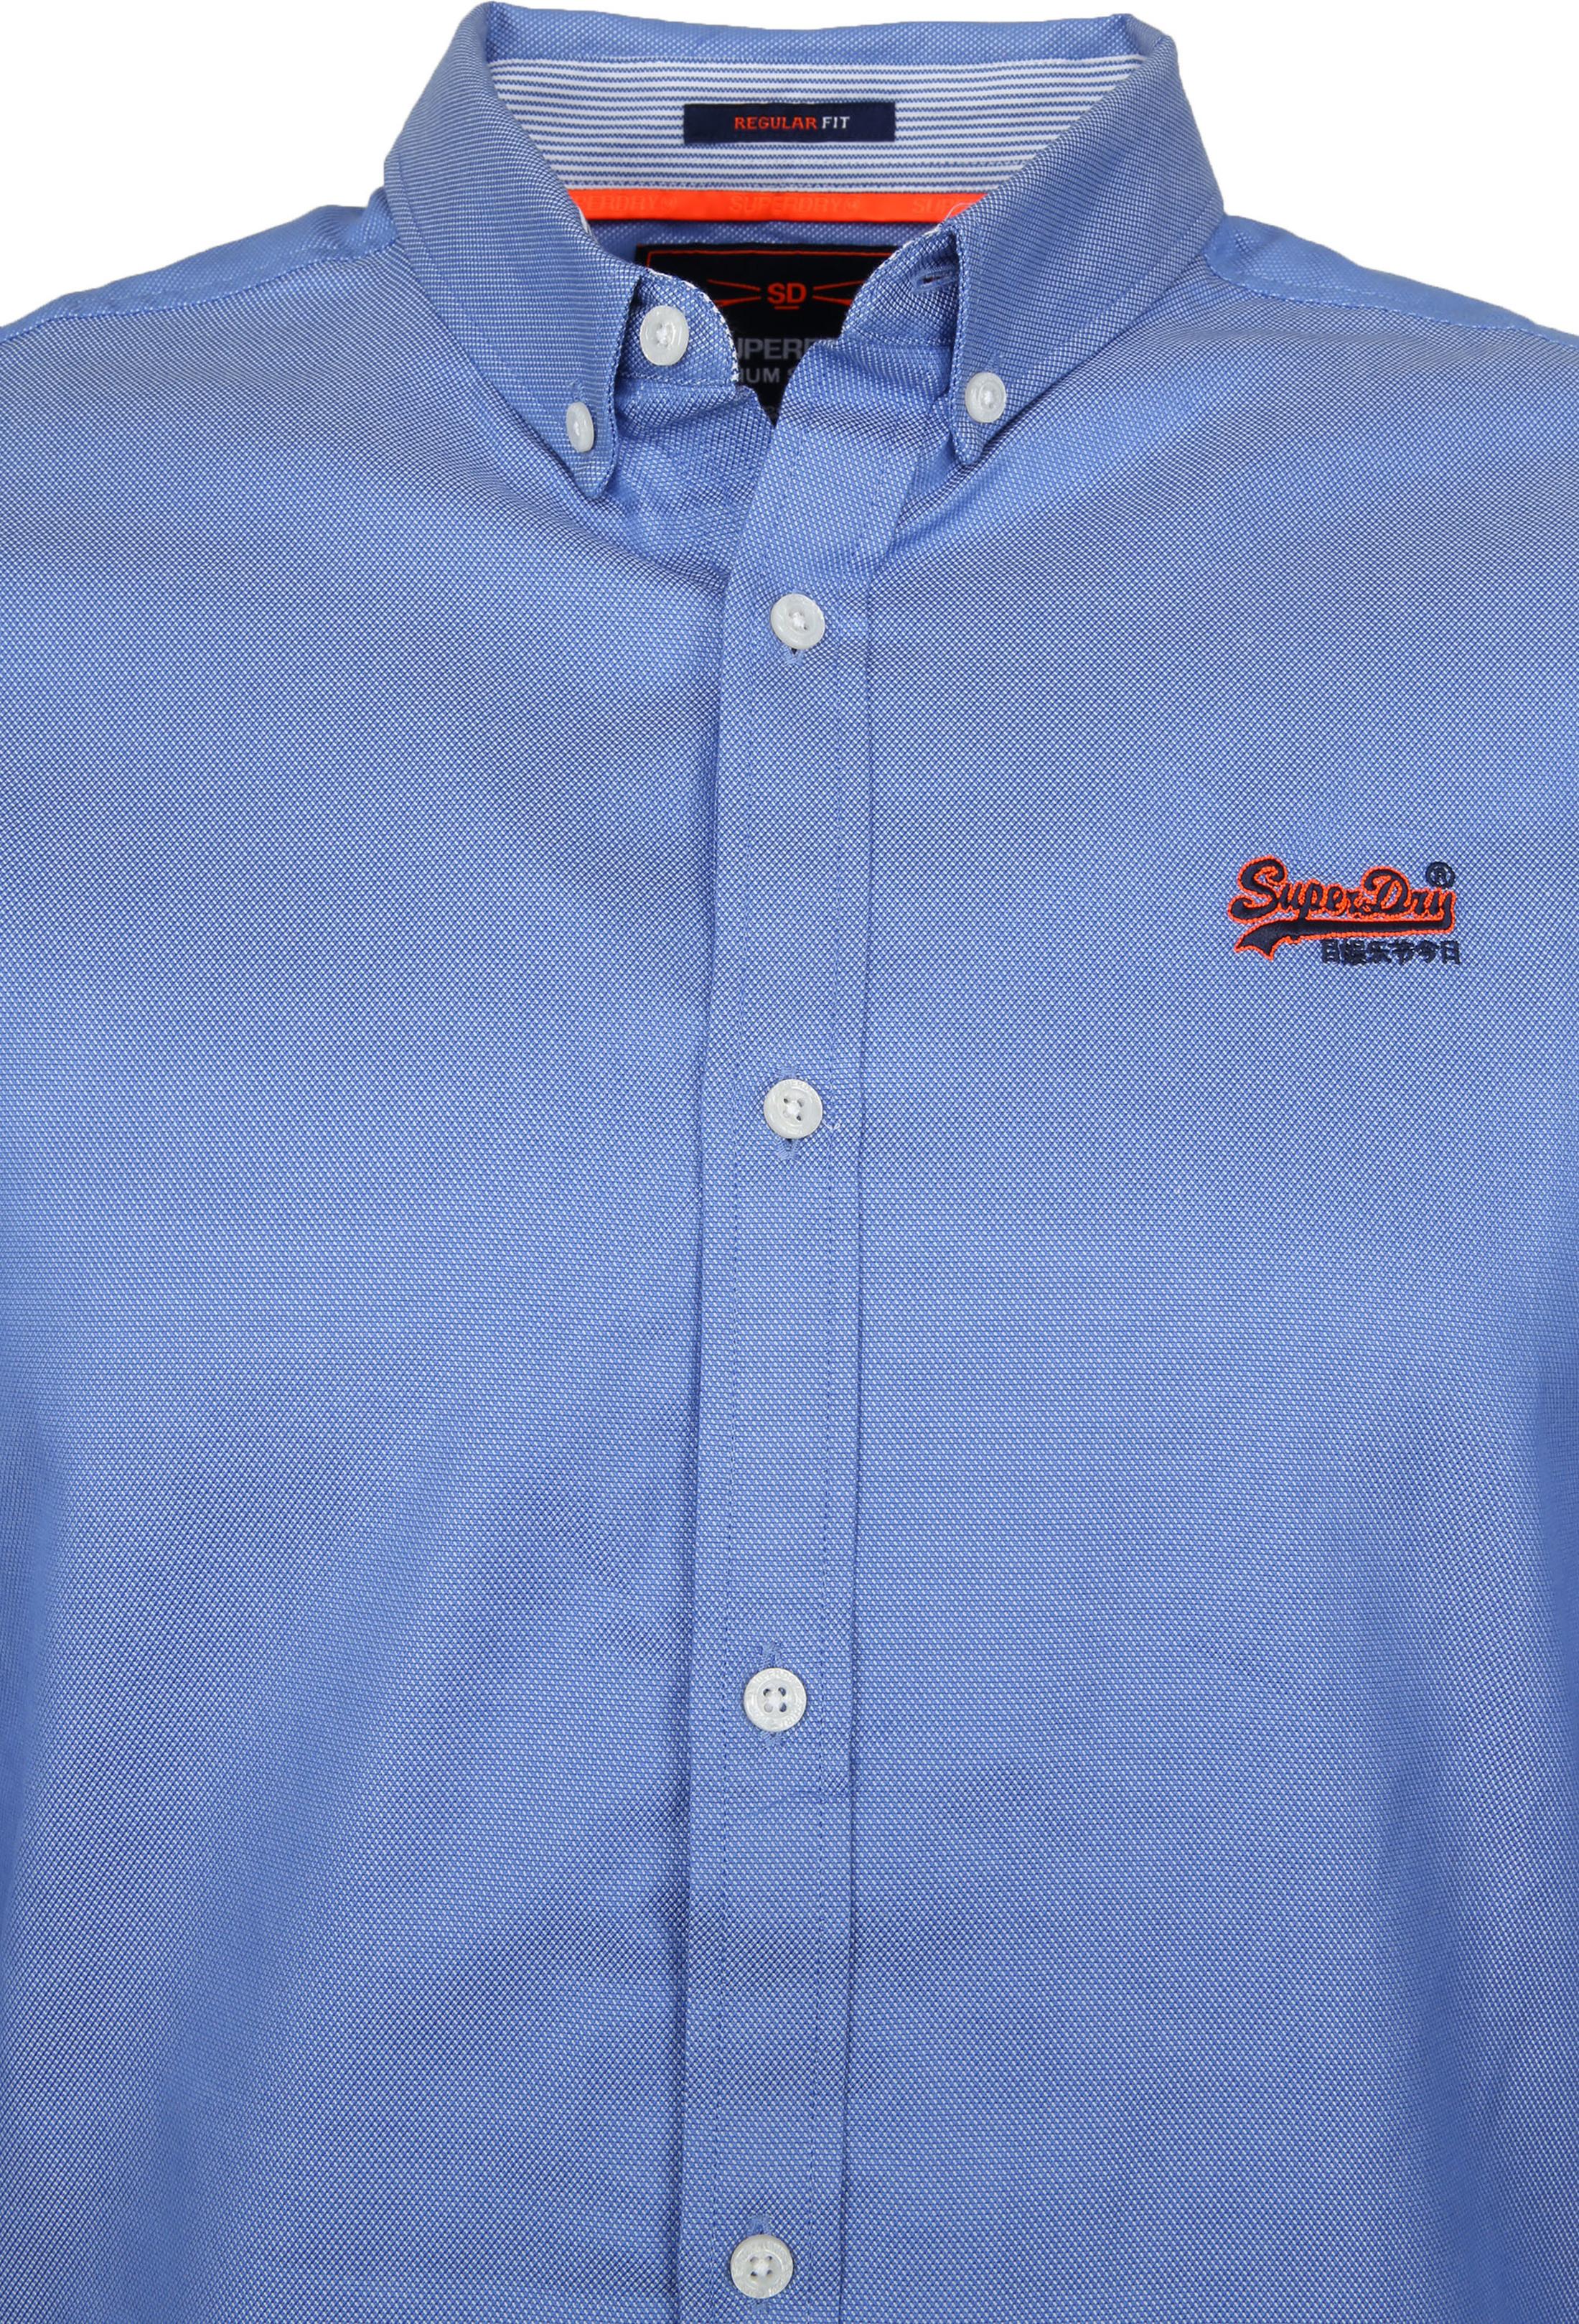 Superdry Overhemd Blauw foto 2